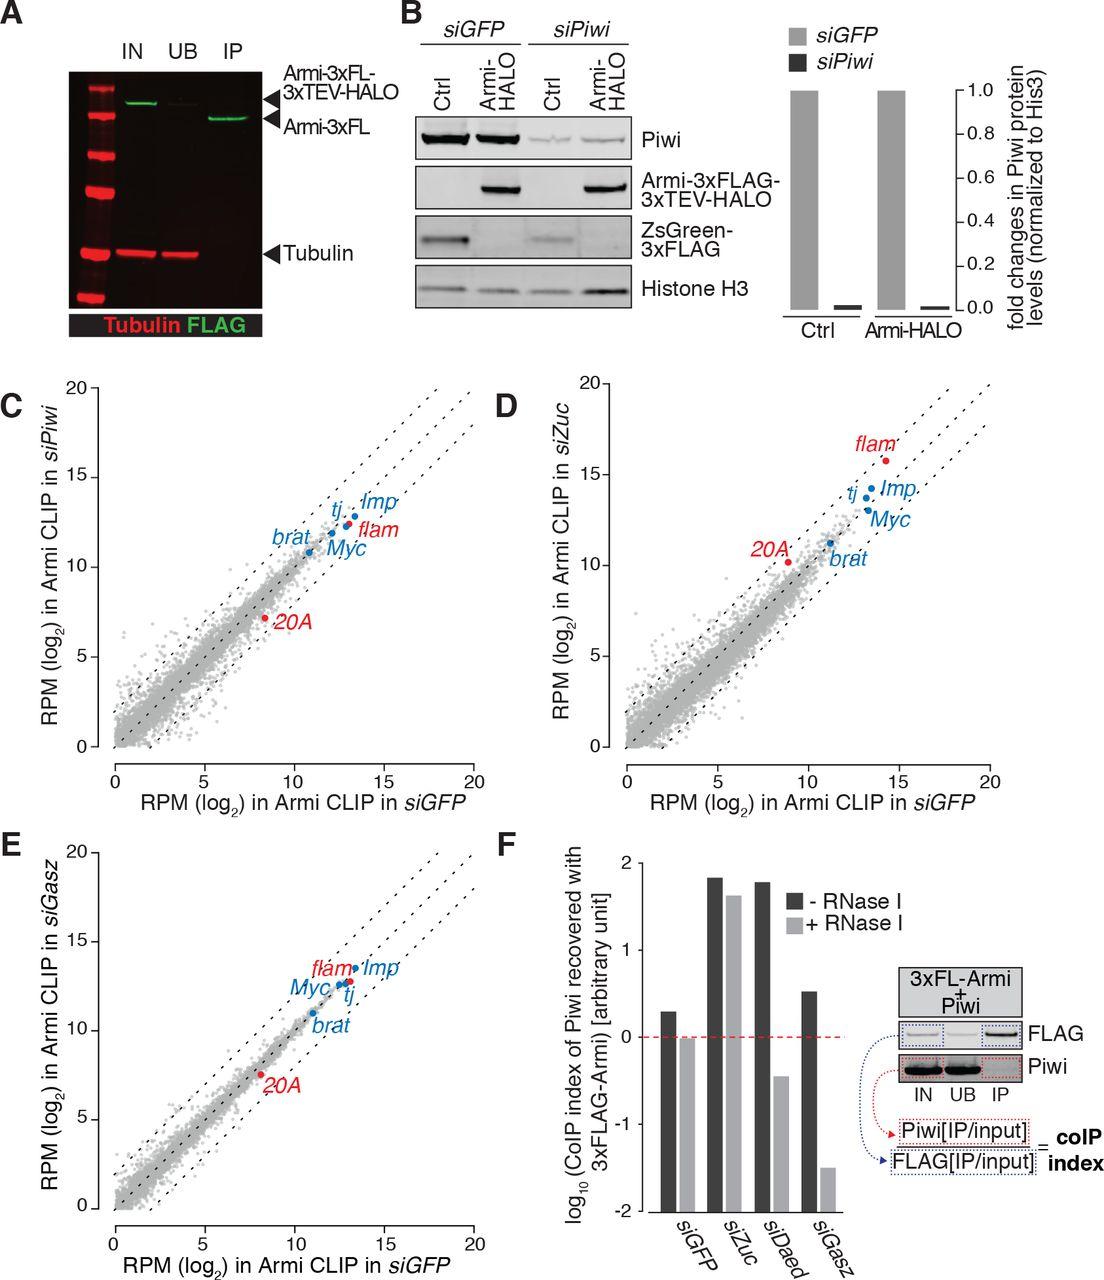 Daedalus and Gasz recruit Armitage to mitochondria, bringing piRNA